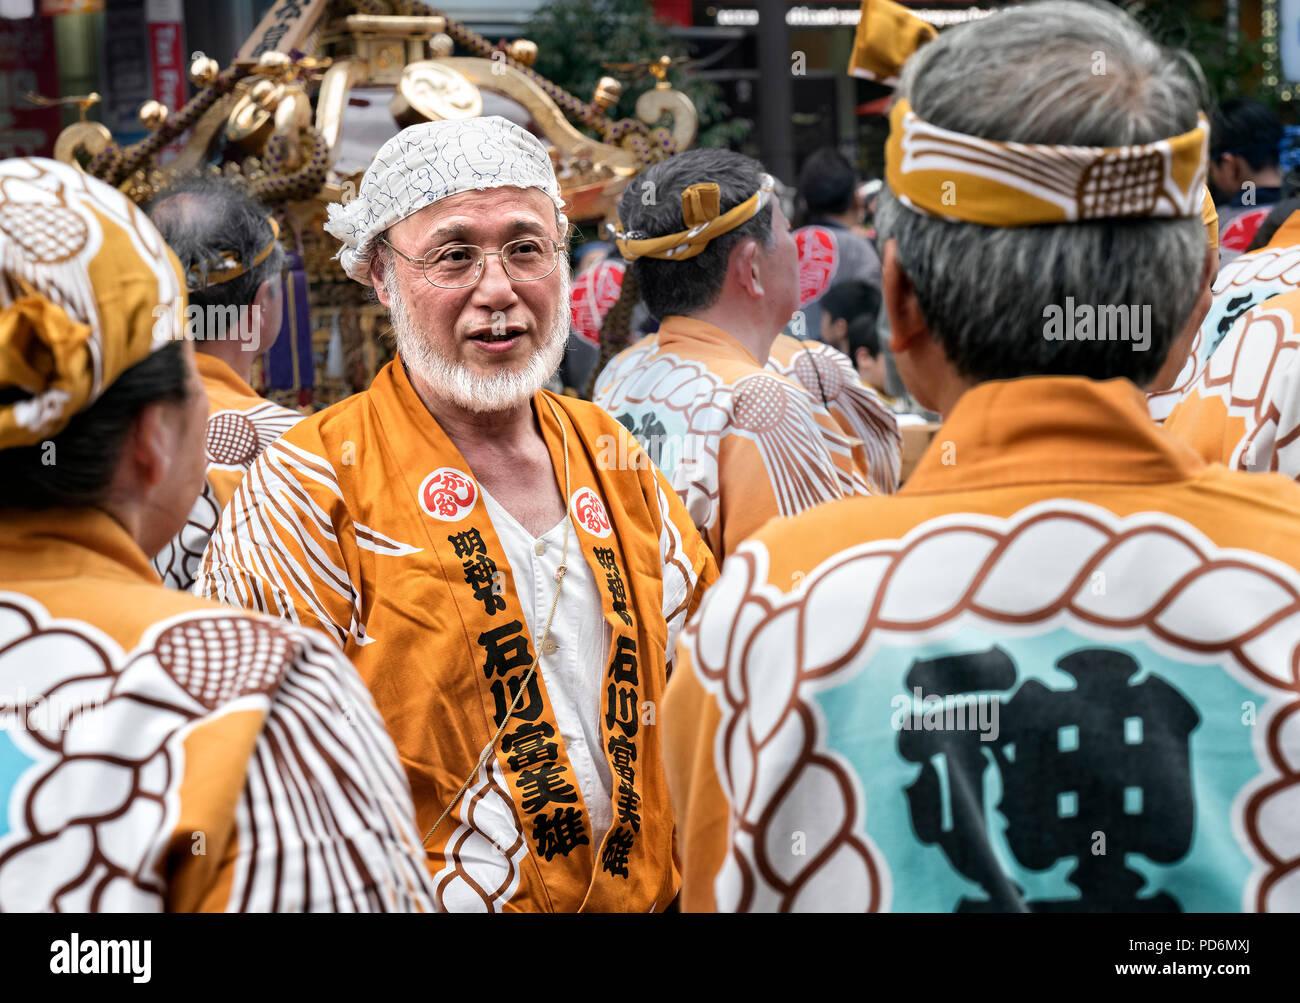 L'île de Honshu, Japon, Tokyo, Kanto, festival, le Kanda matsuri. Photo Stock